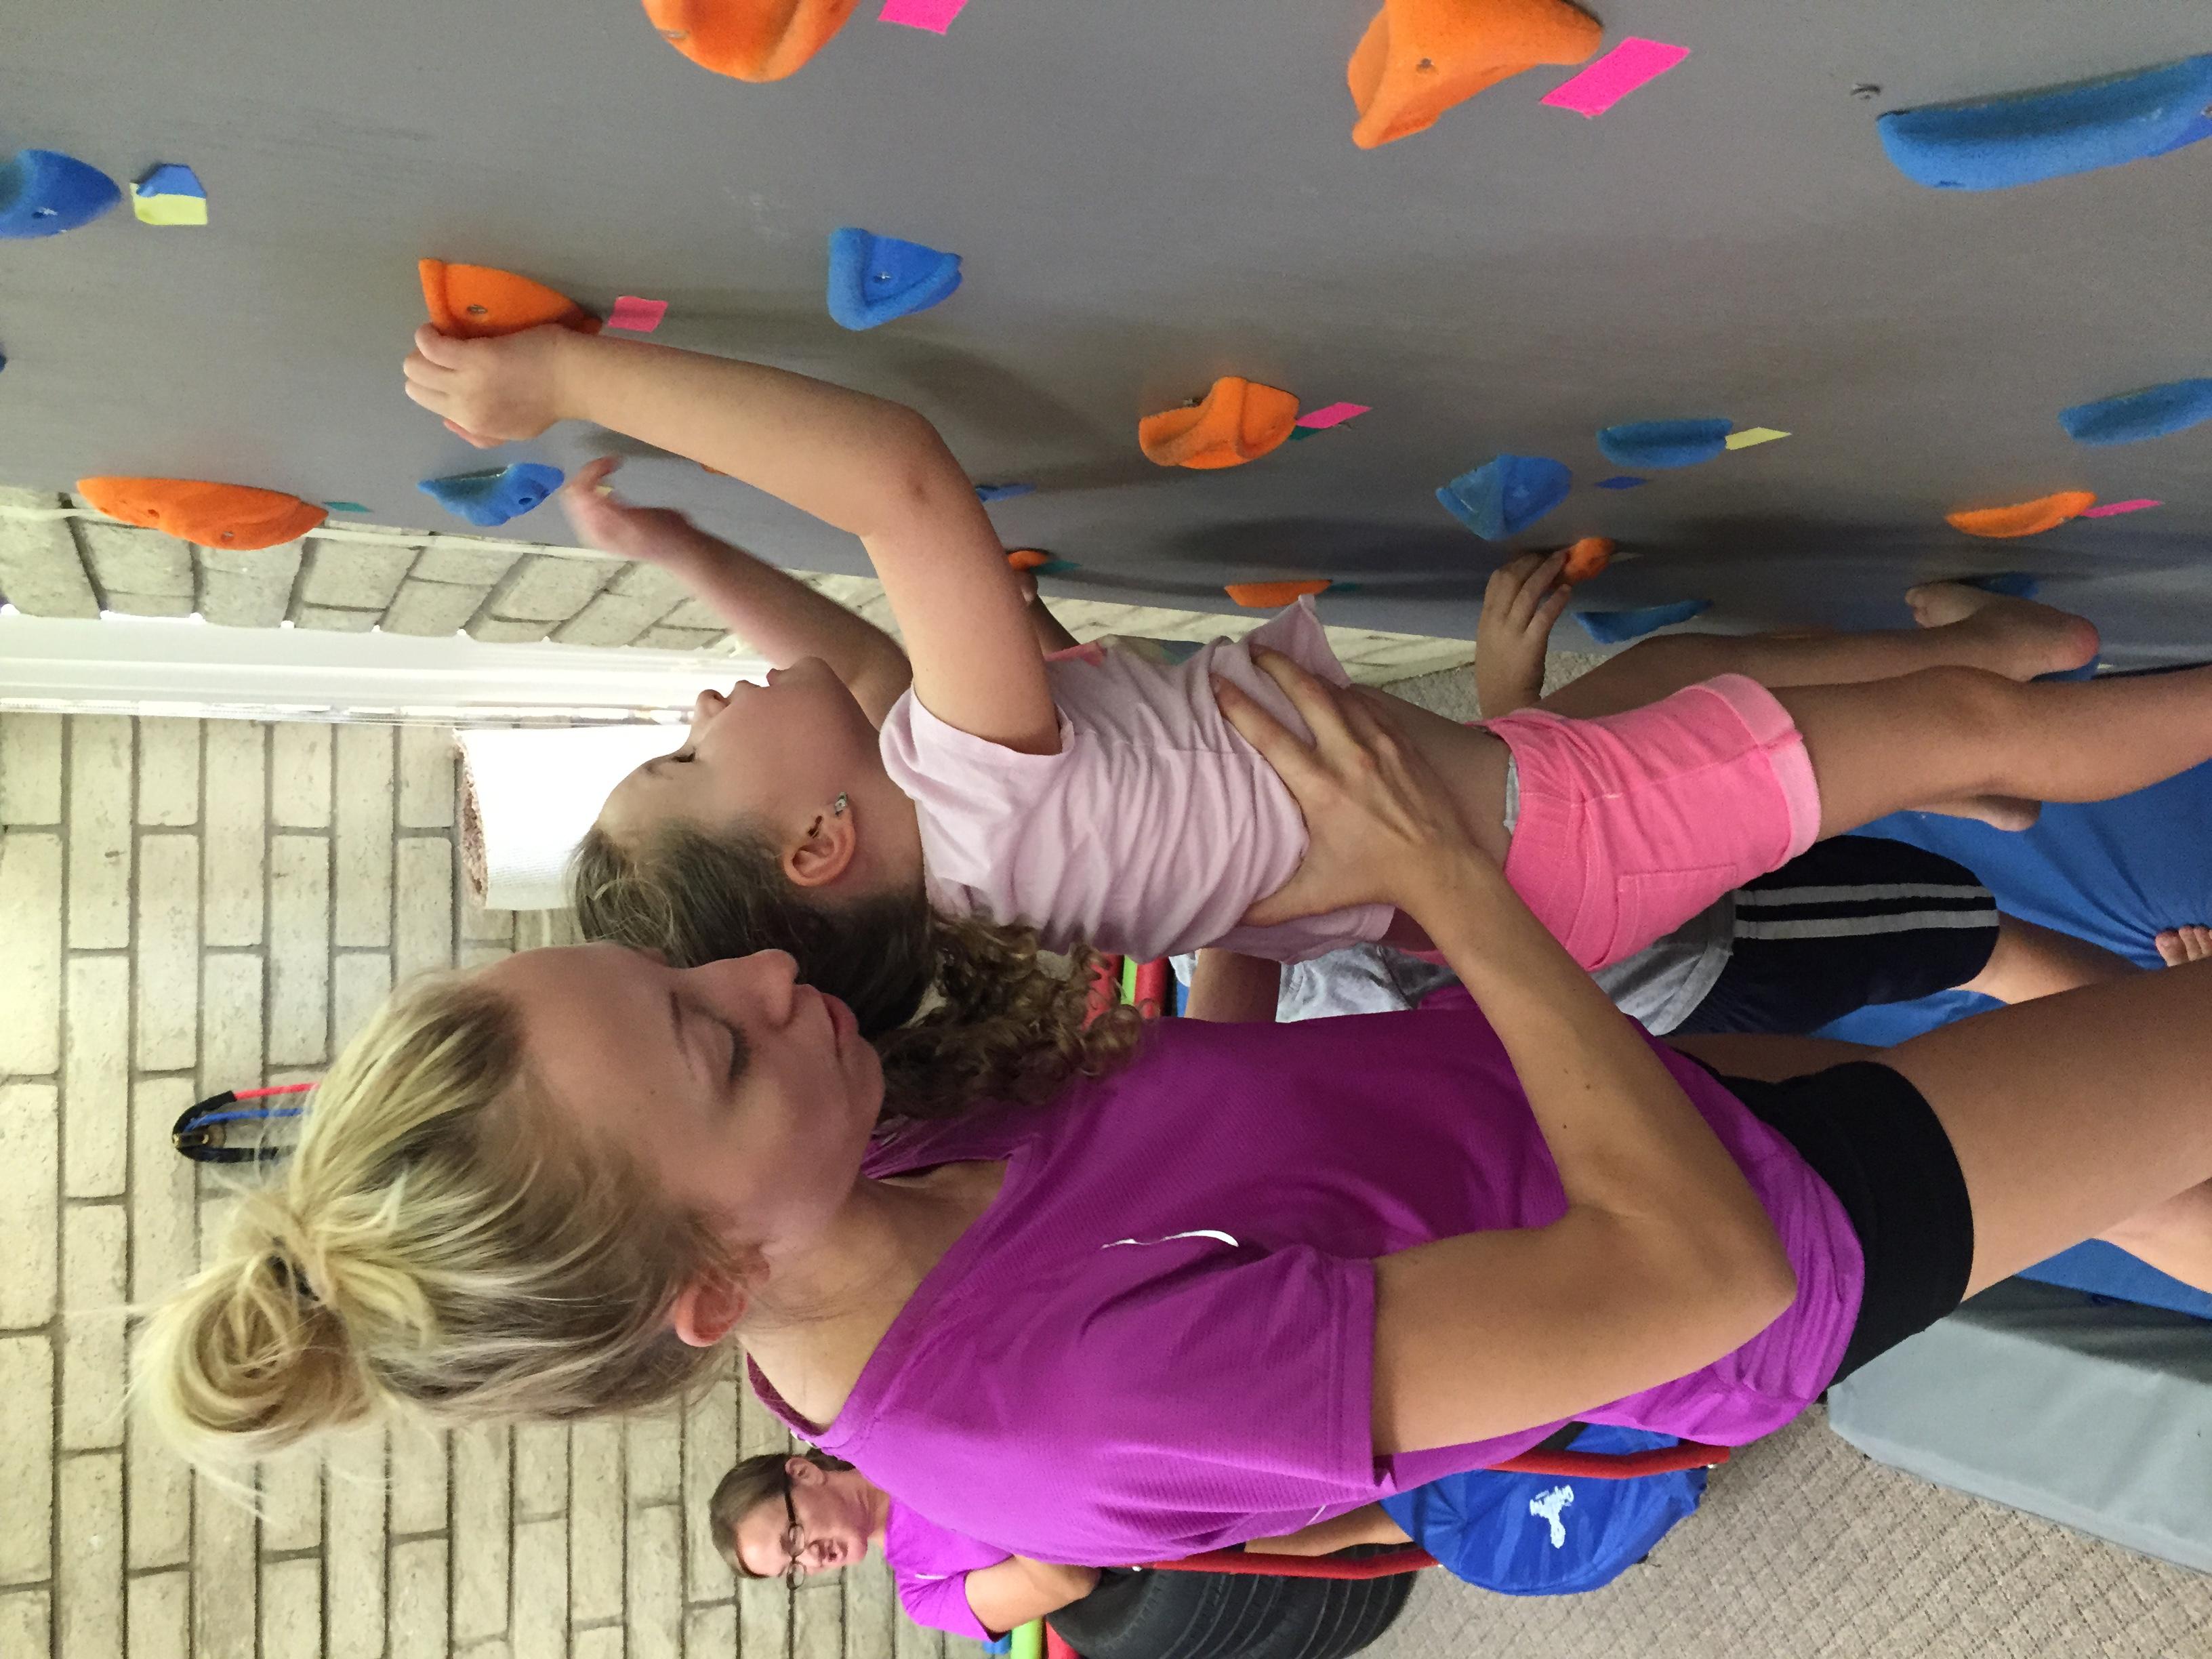 Woman assisting little girl up rock climbing wall